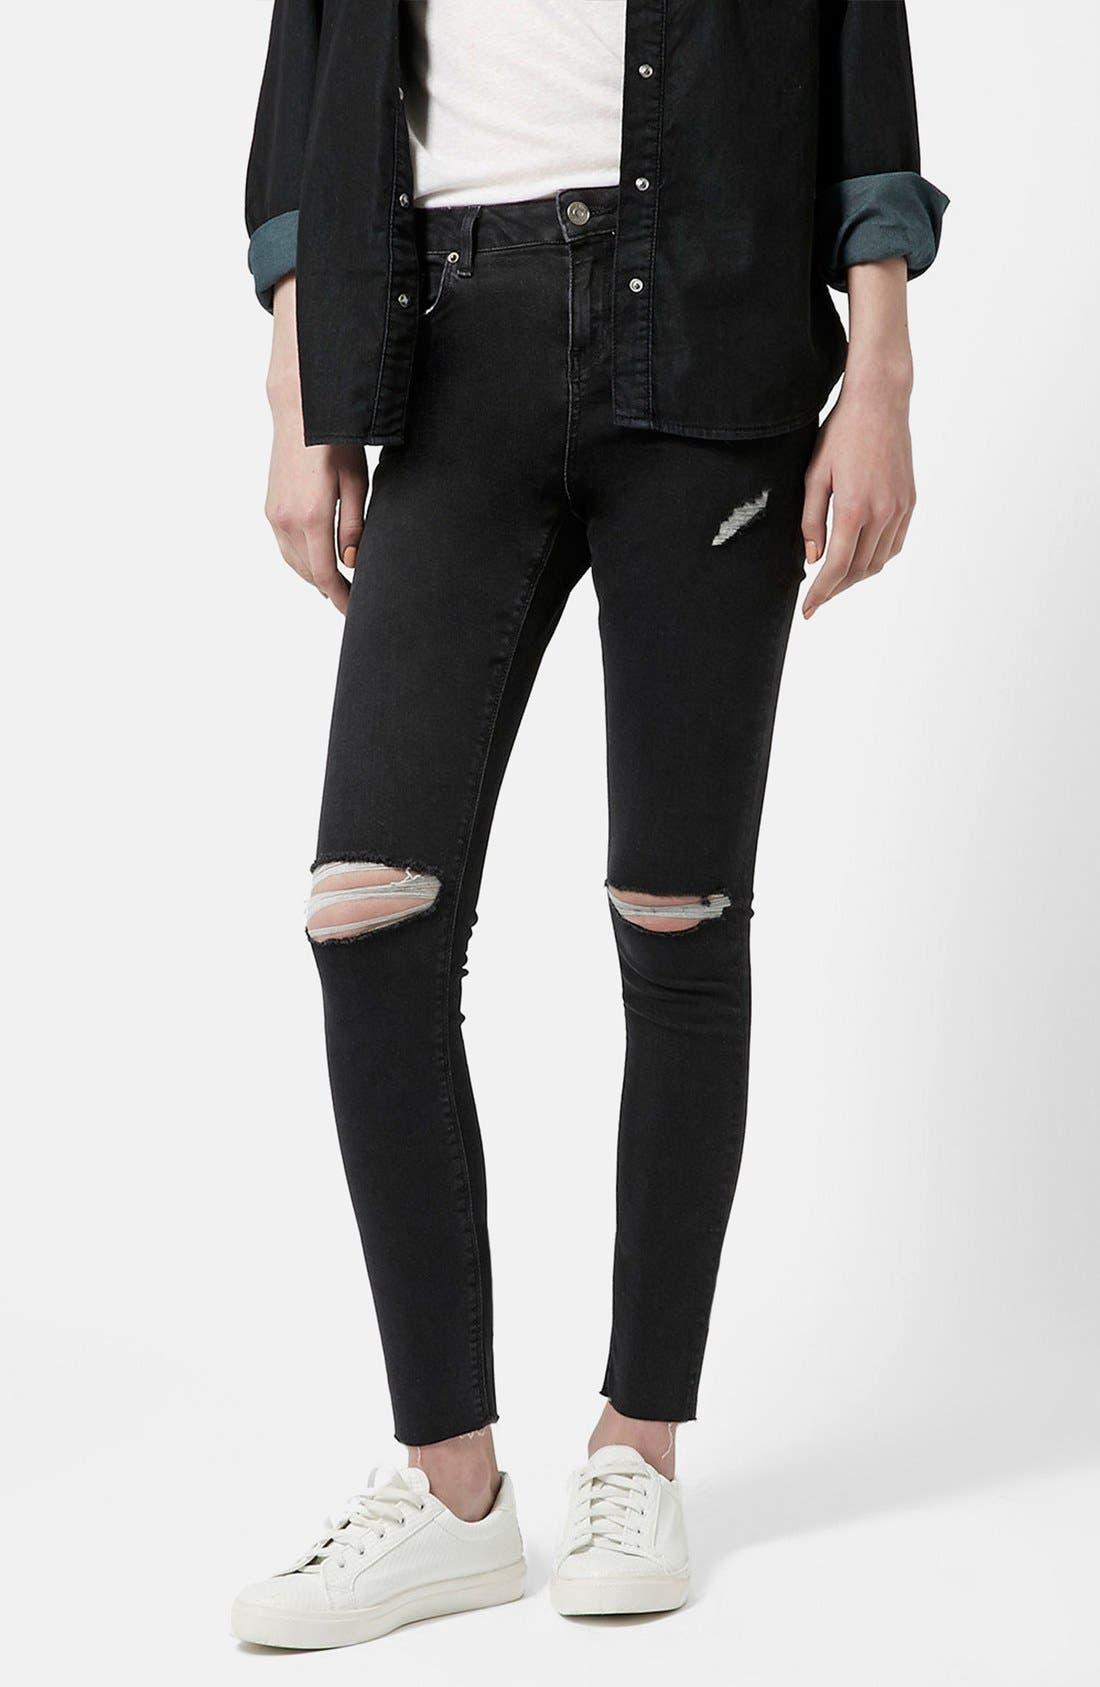 Alternate Image 1 Selected - Topshop 'Jamie' Ripped Skinny Jeans (Black) (Petite)